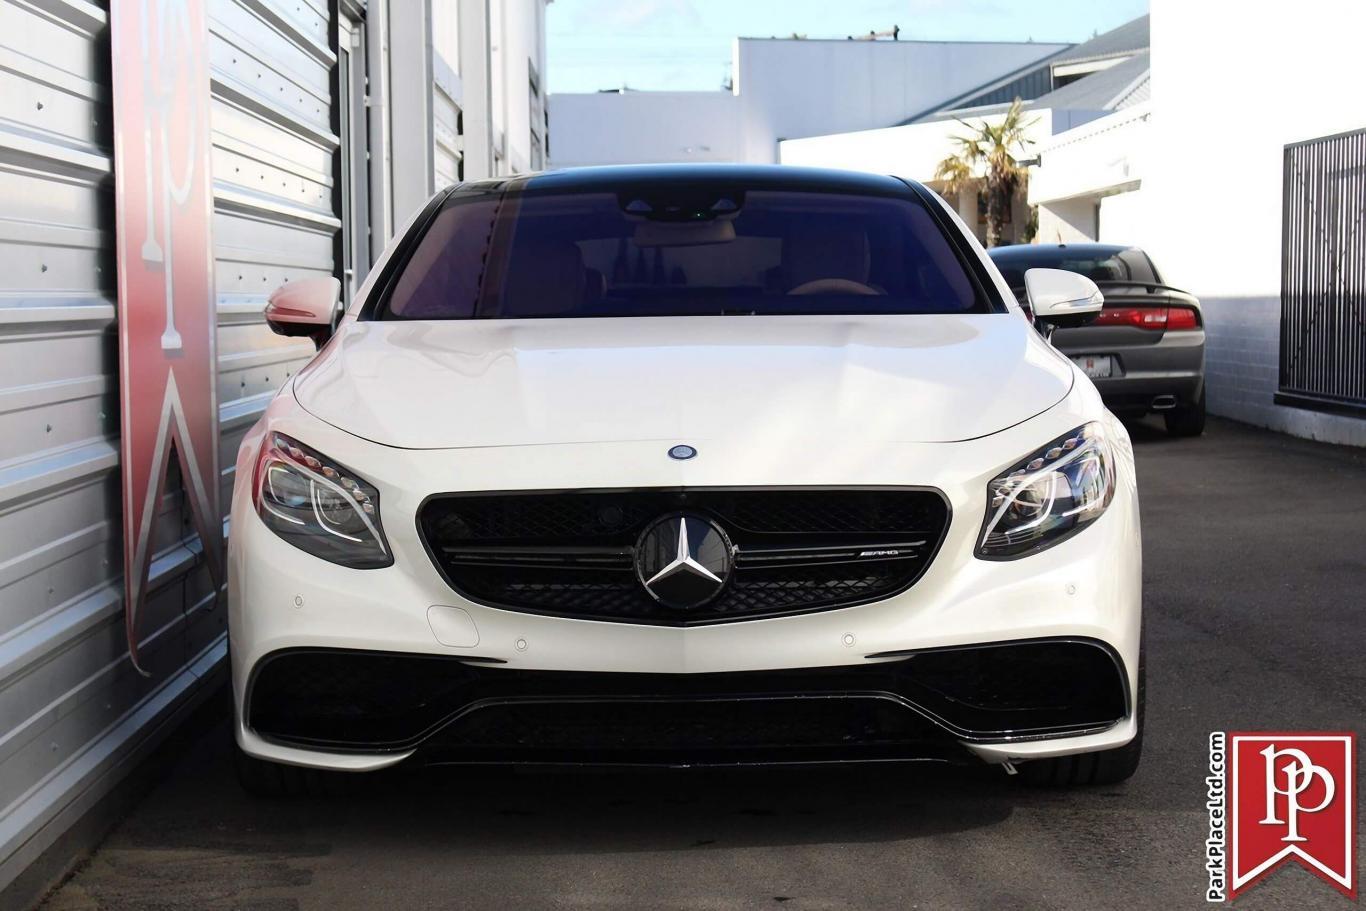 Mercedes Benz S63 Amg Coupe >> Mercedes Benz S63 Amg Coupe